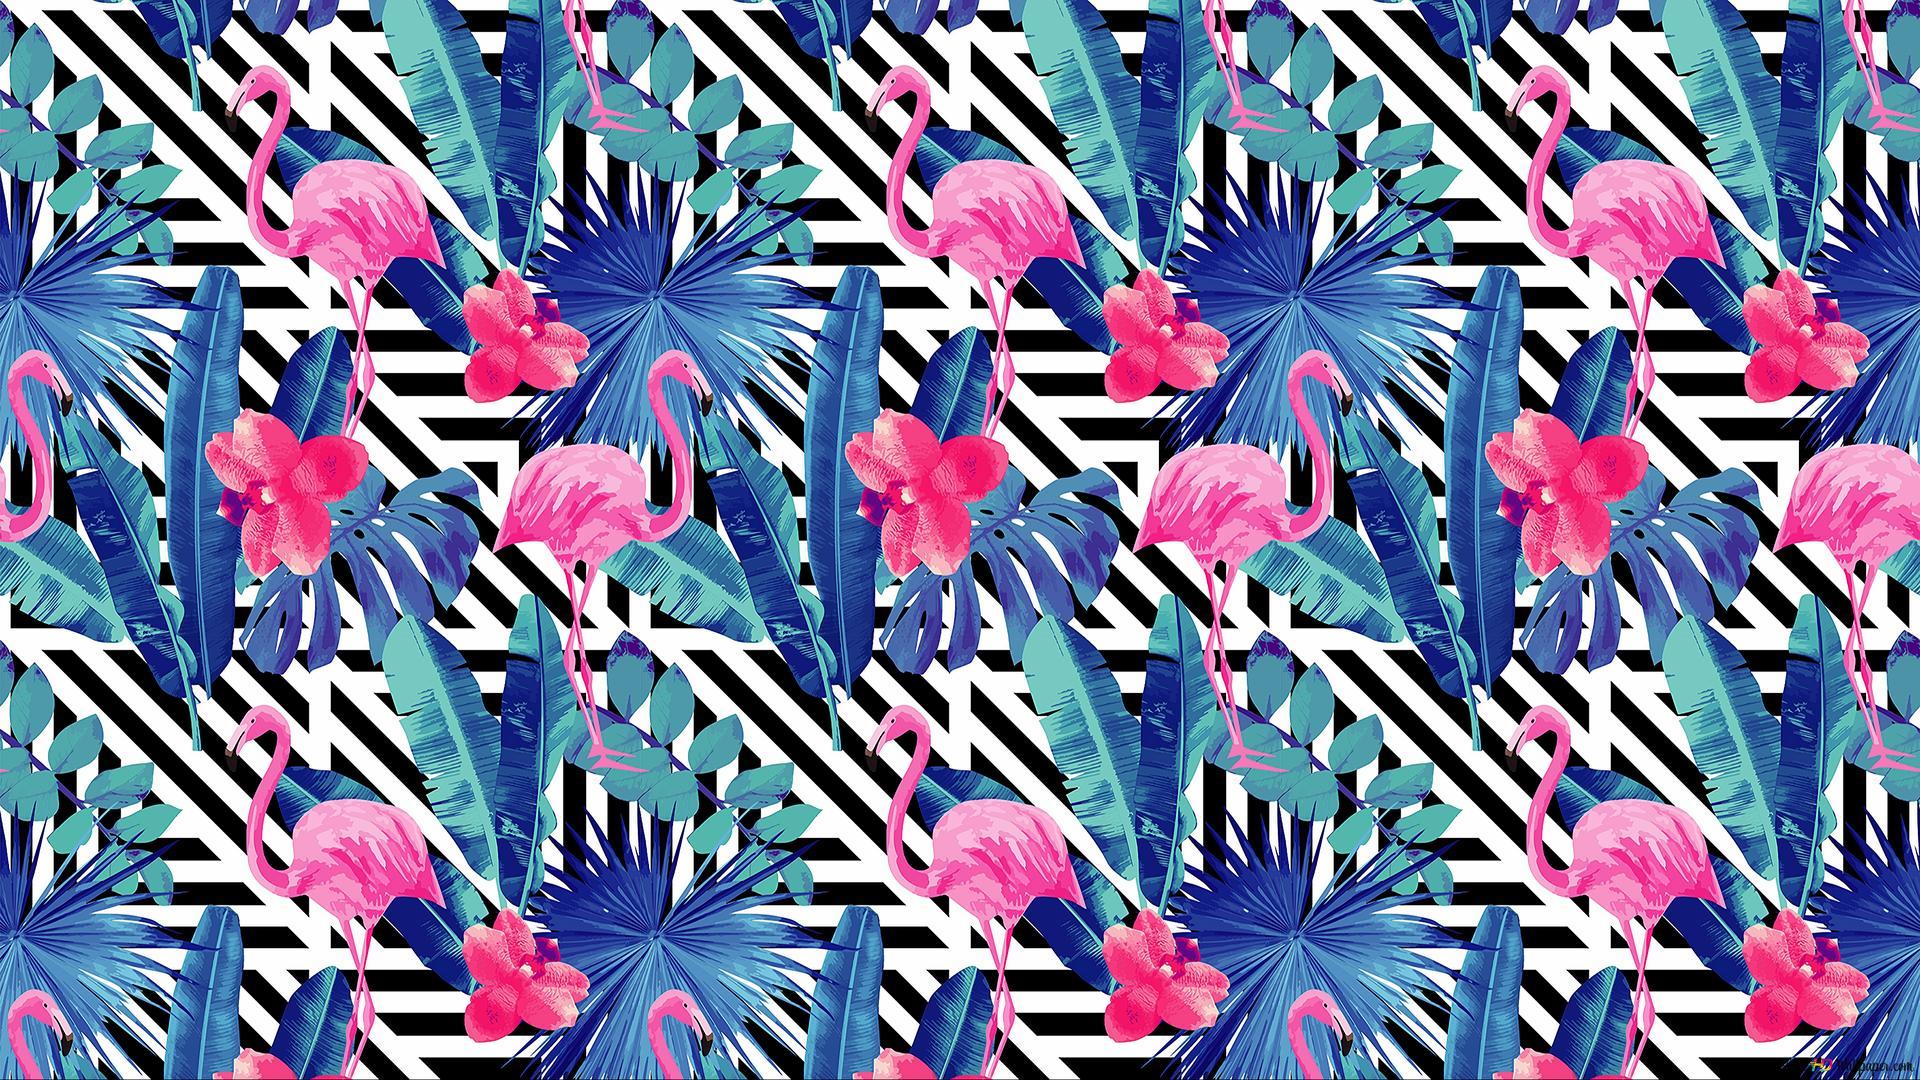 Pink Flamingo Pattern Hd Wallpaper Download